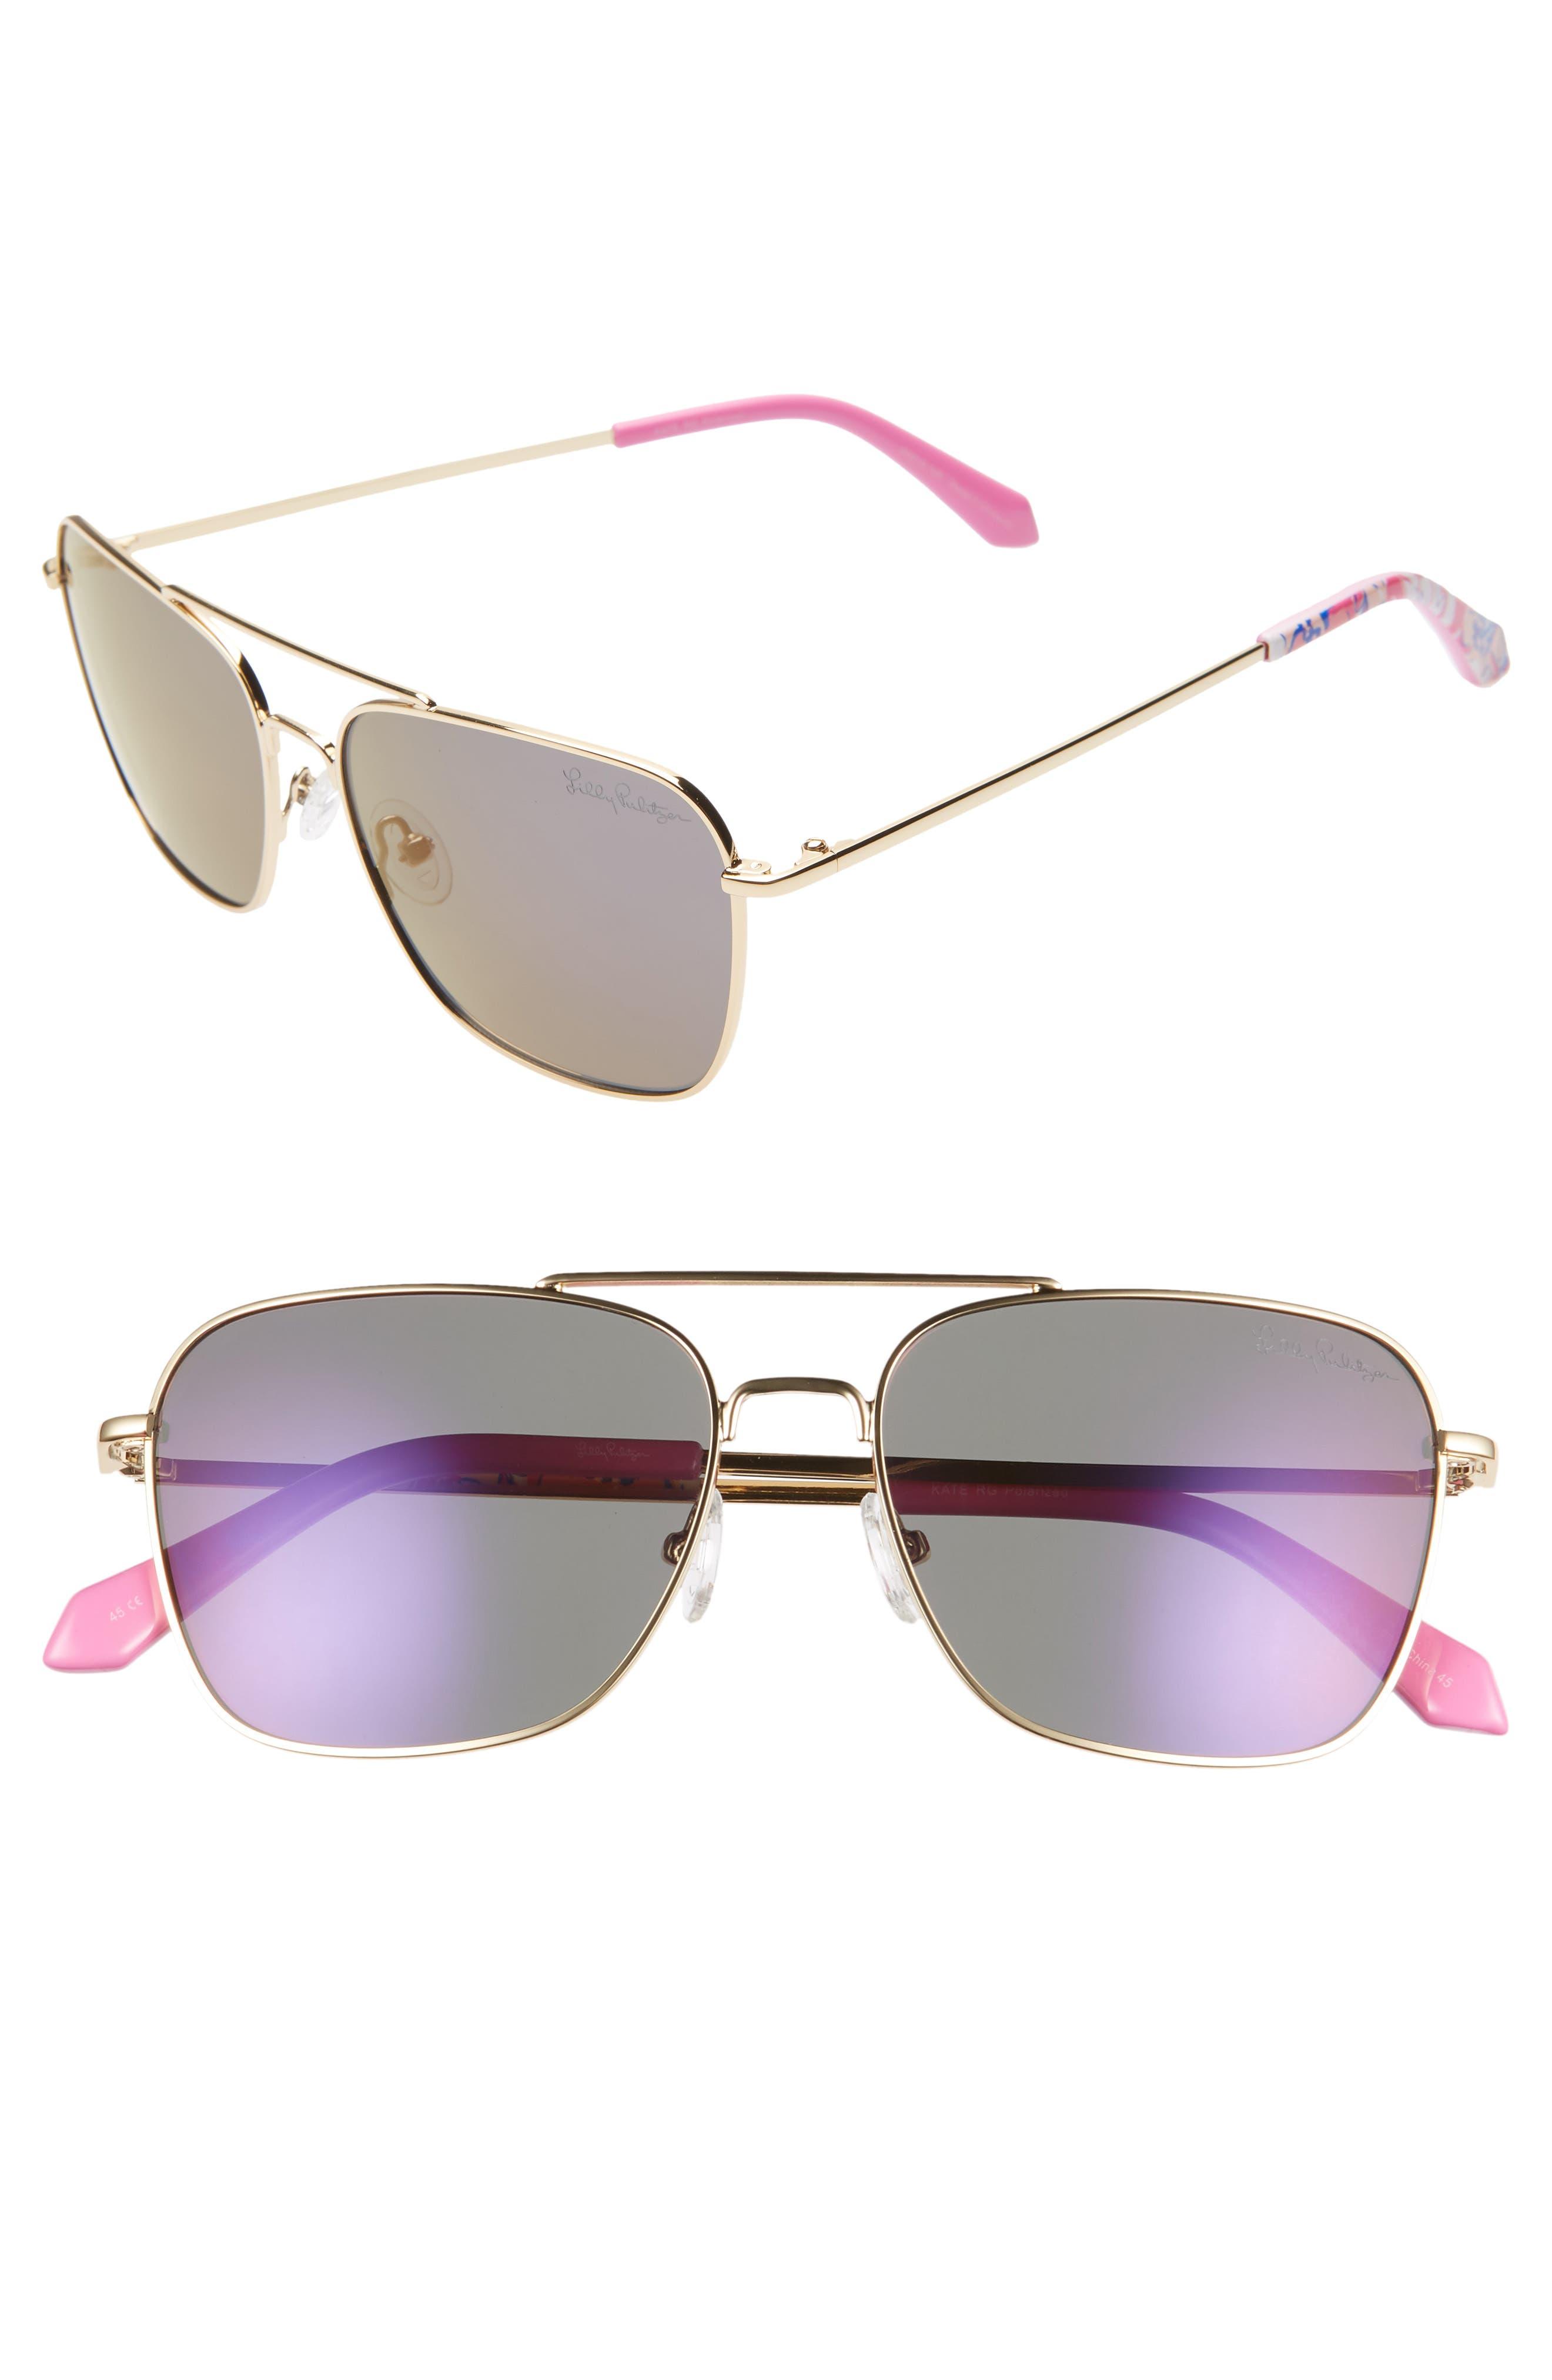 Lilly Pulitzer Kate 55Mm Aviator Sunglasses - Shiny Gold/ Lavendar